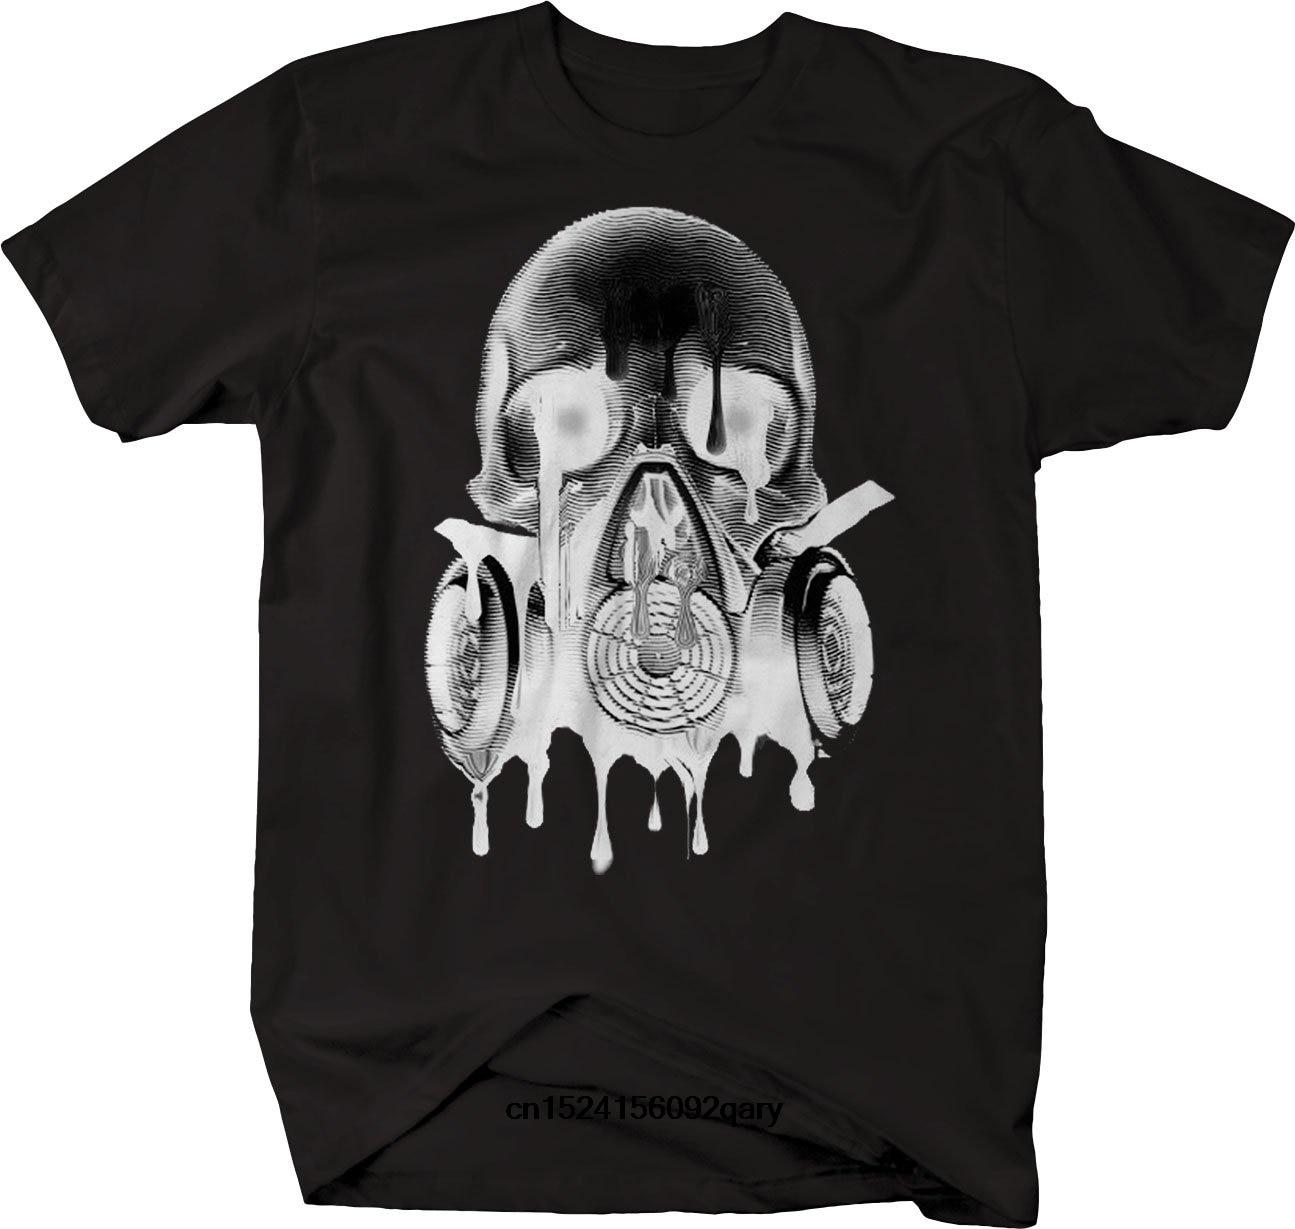 Tops & Tees Melting Skull Gas Mask Goth Rock Hardcore Tshirt T-shirts Men Funny T Shirt Women Cool Tshirt Retro